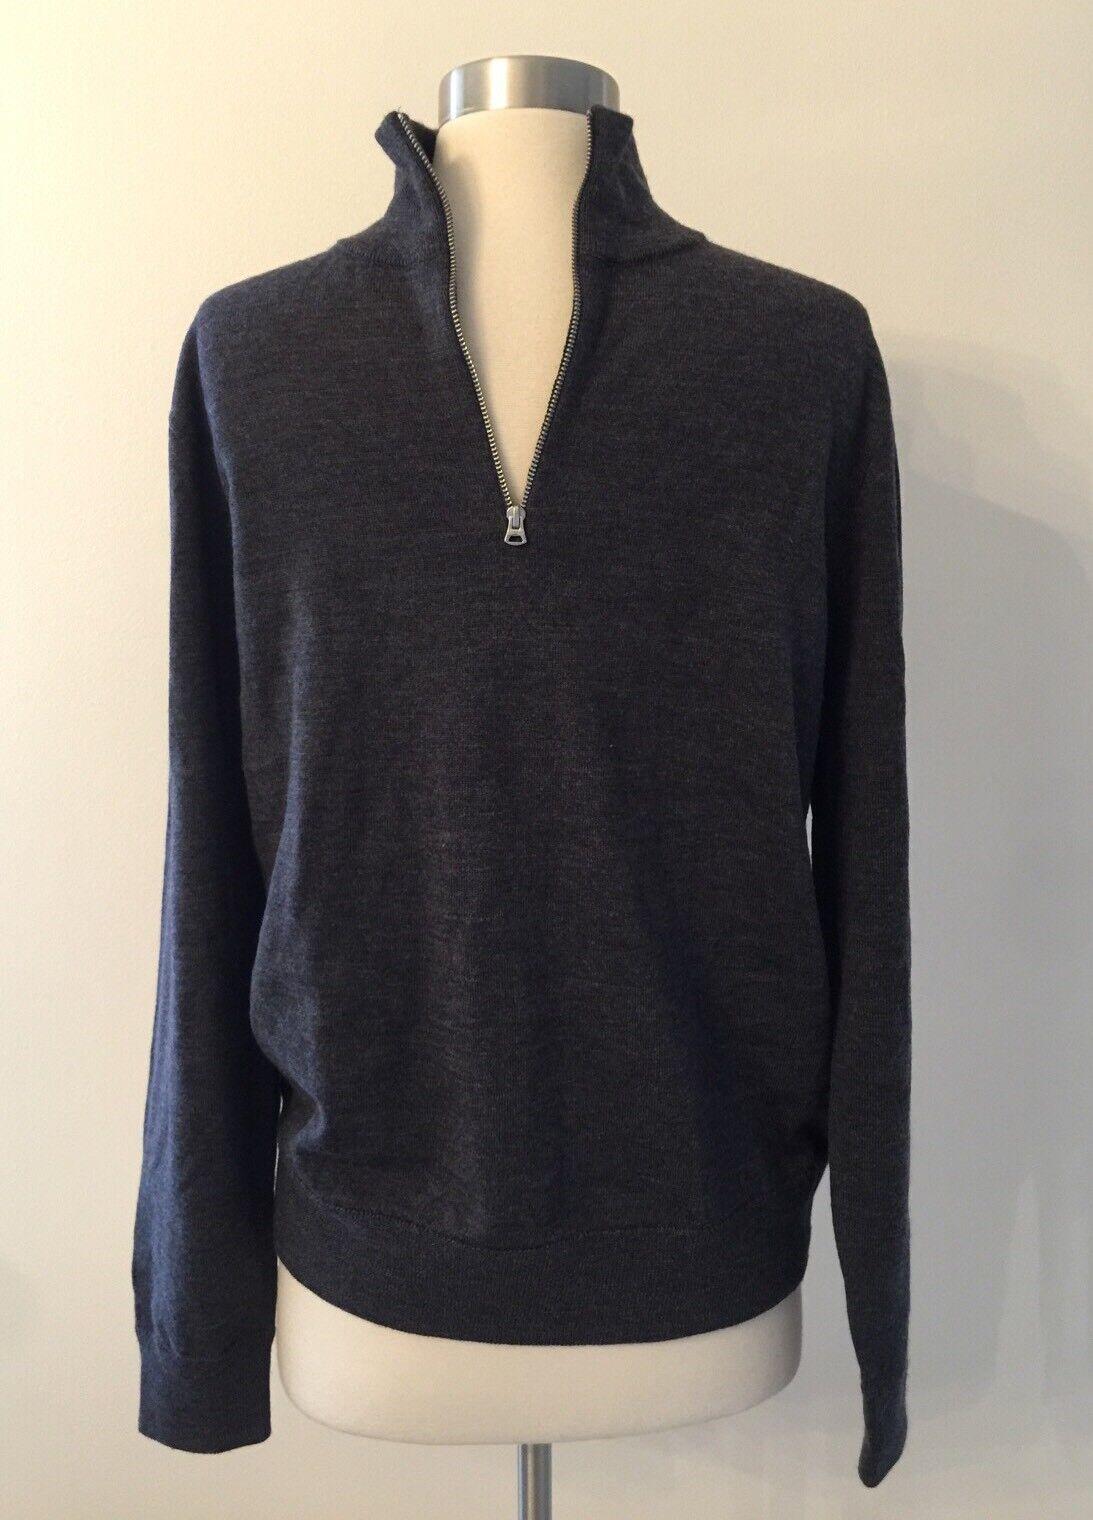 New J crew mens Italian merino wool Half Zip sweater grau Medium M/L H0114